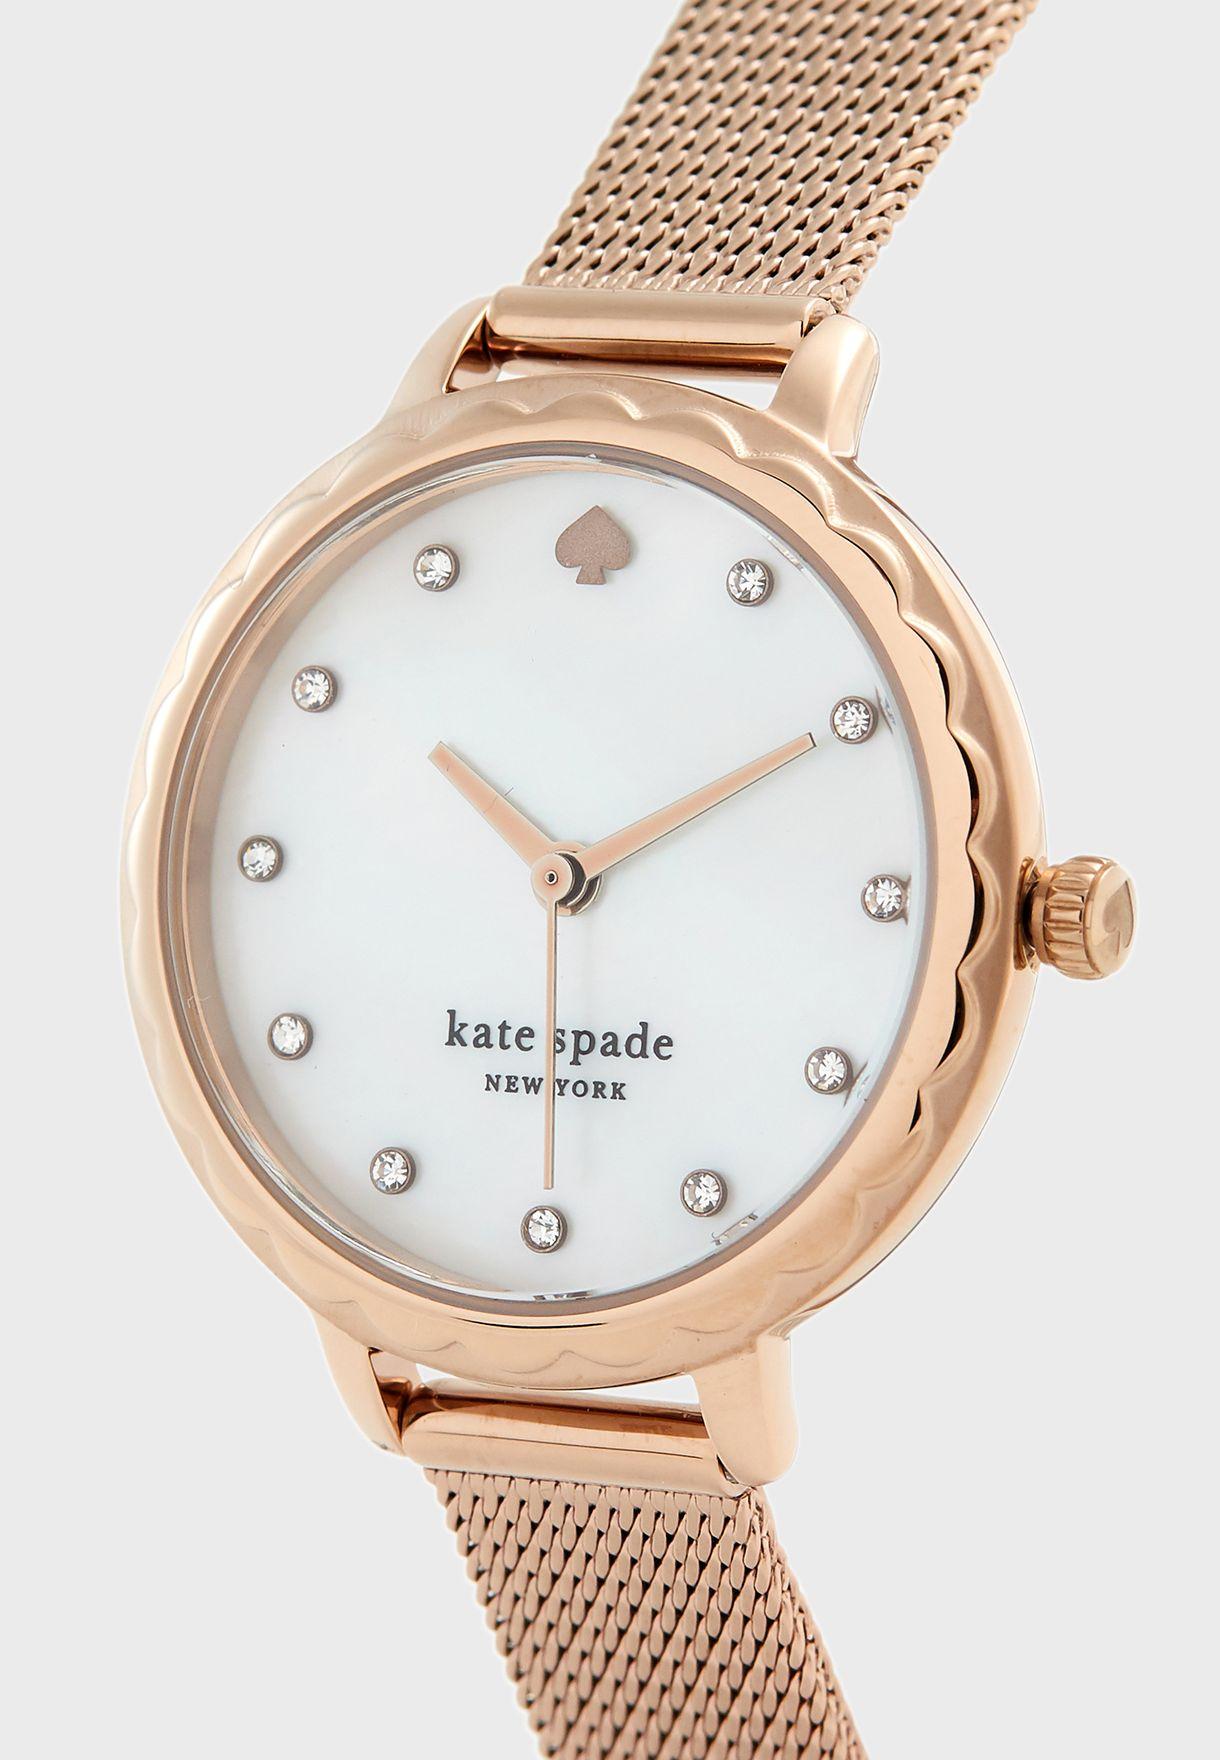 KSW1572 Morningside Analog Watch